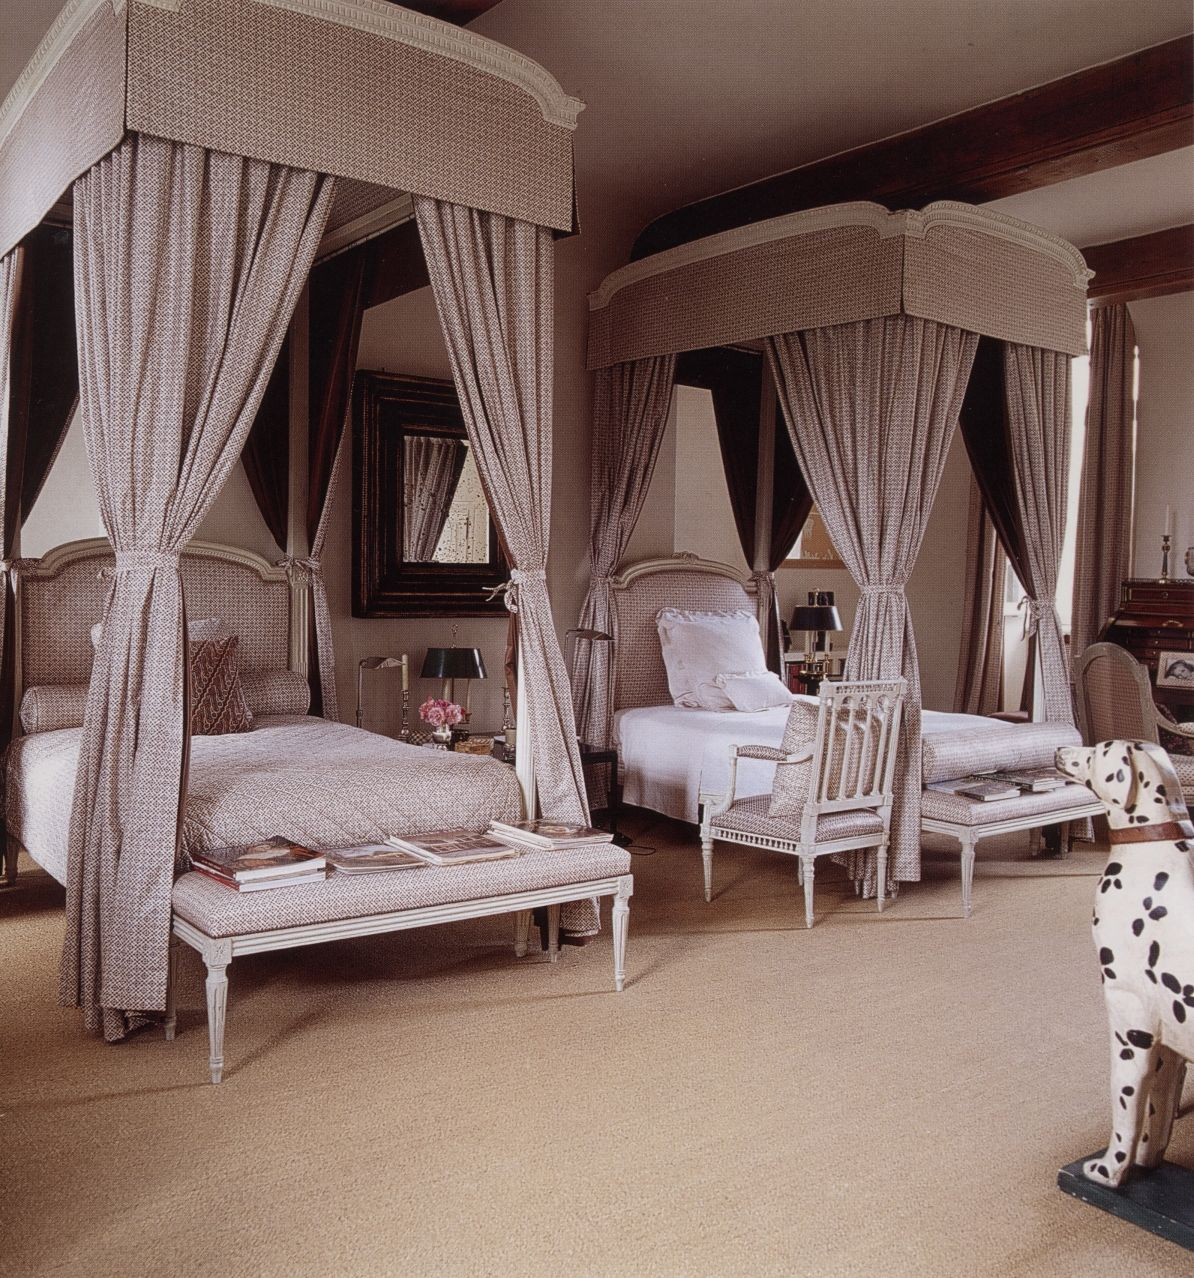 "Hubert de Givenchy - A guest bedroom at Château du Jonchet.  From the French book ""L'esprit des lieux"" by Christiane de Nicolaÿ-Mazery."